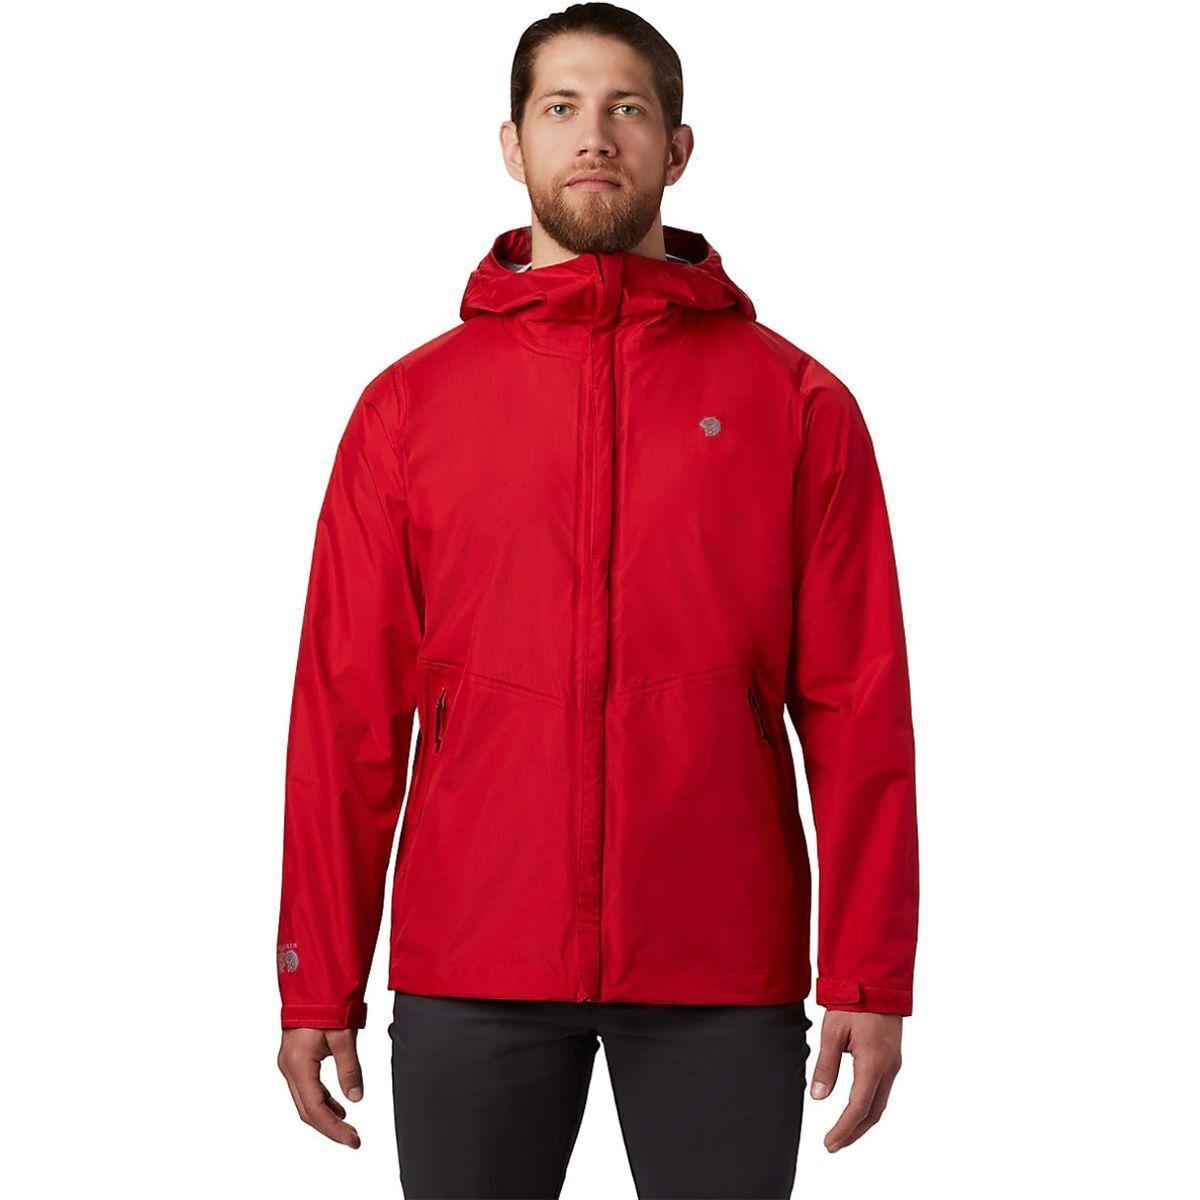 Acadia Jacket - Men